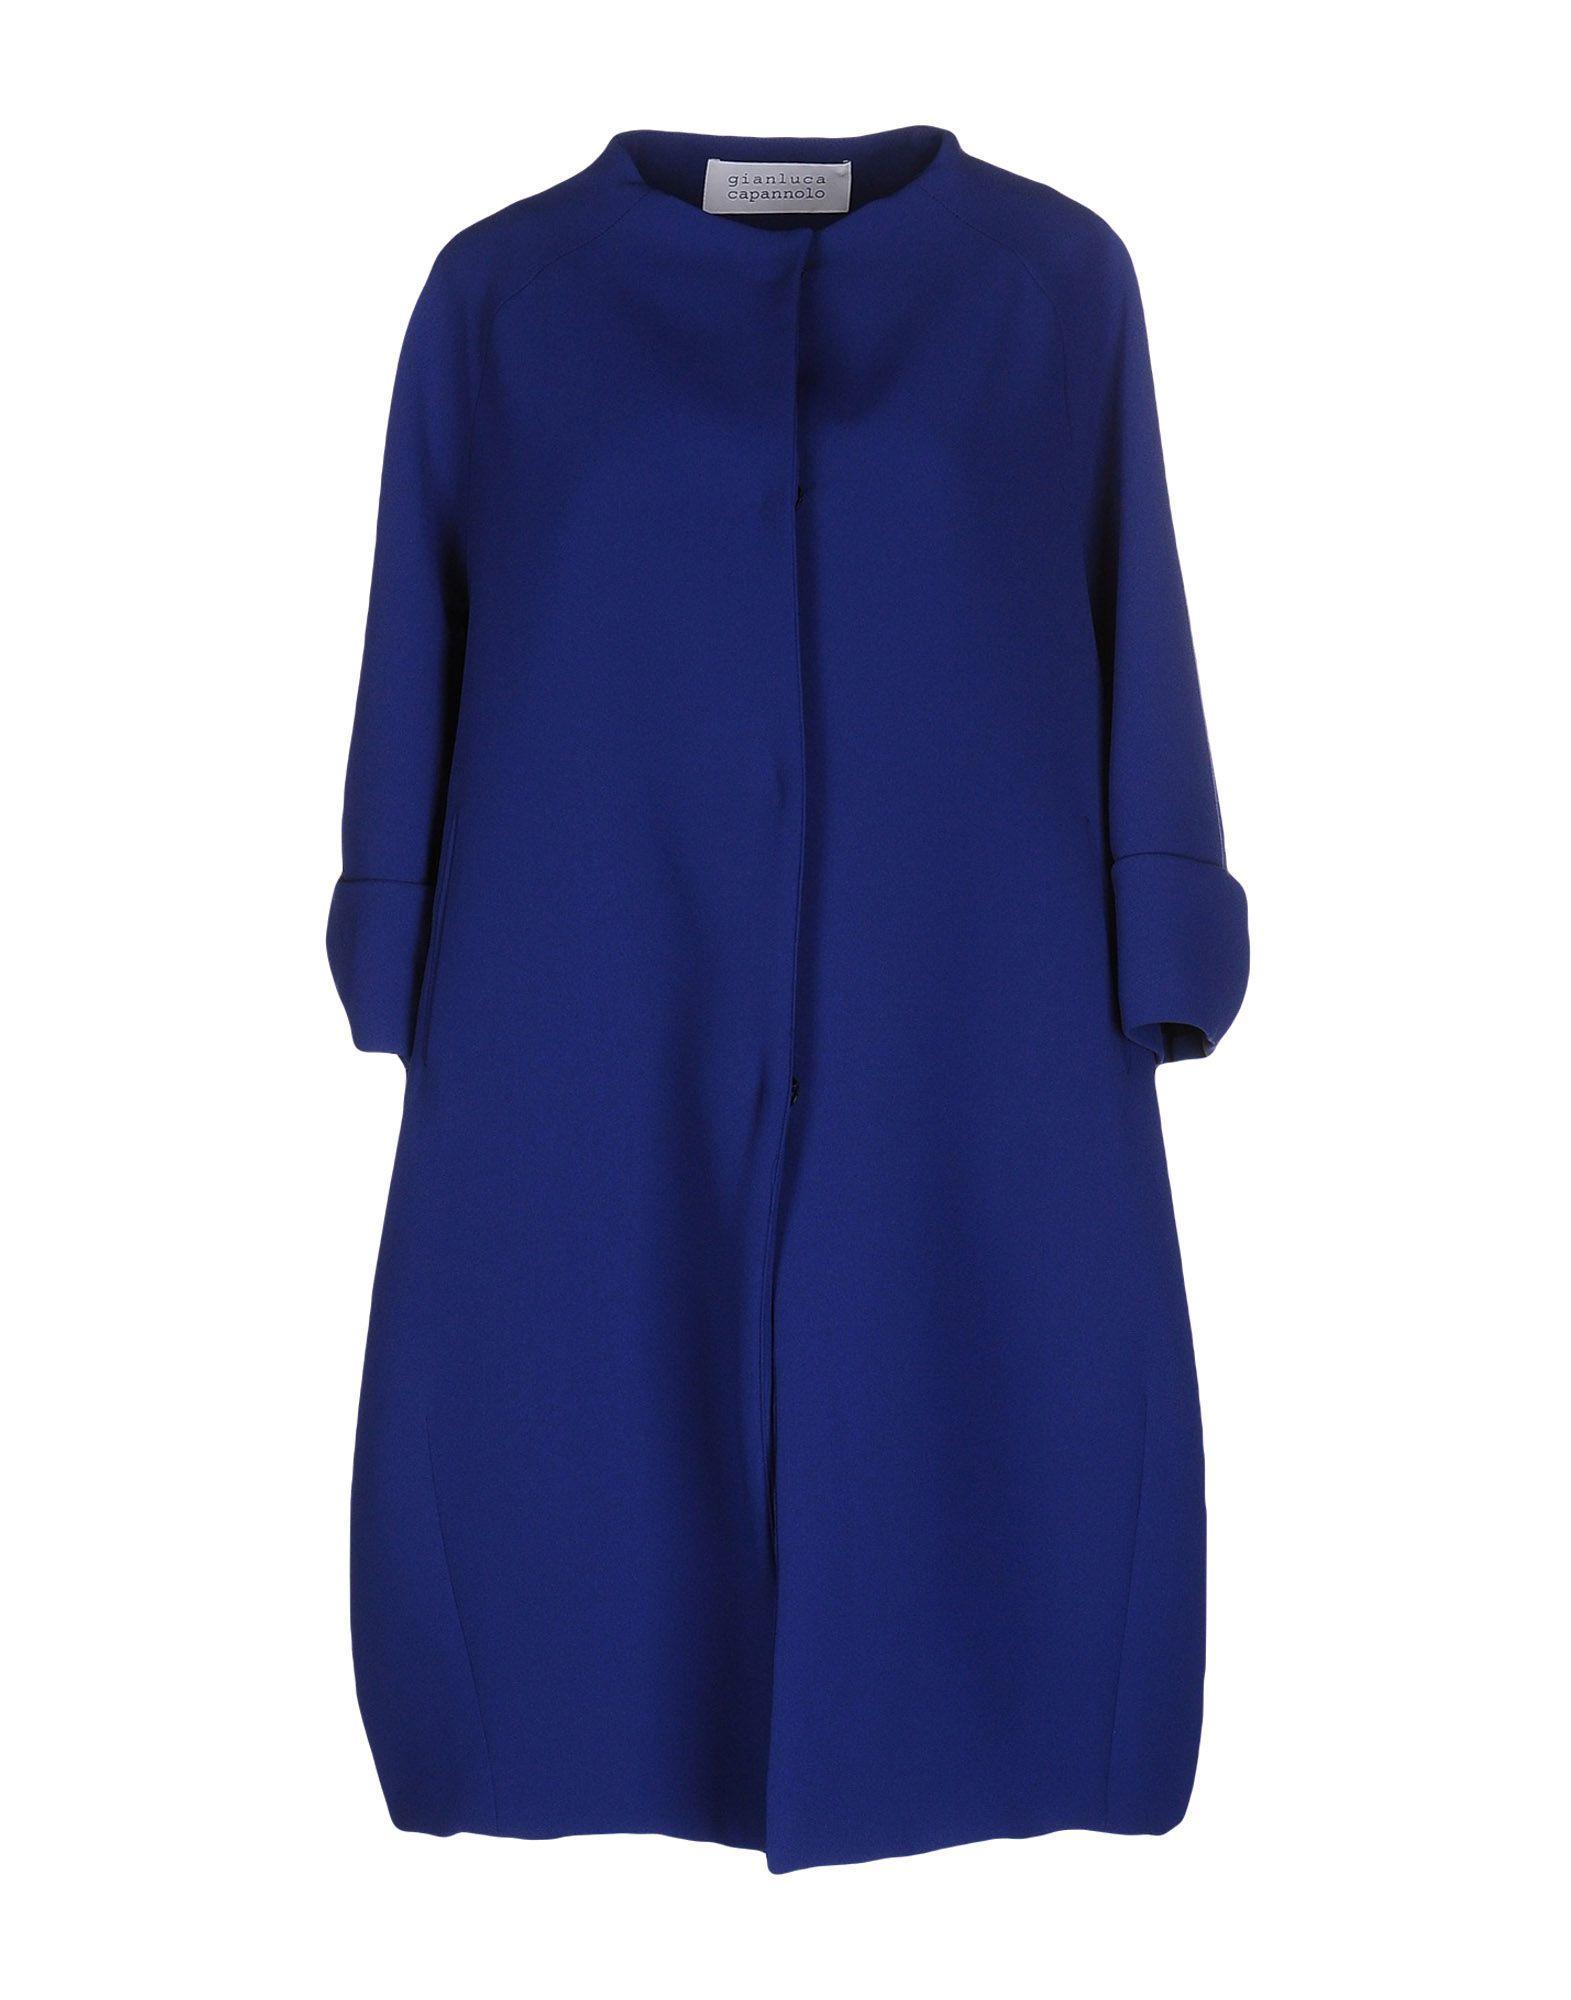 Gianluca Capannolo Coat In Blue